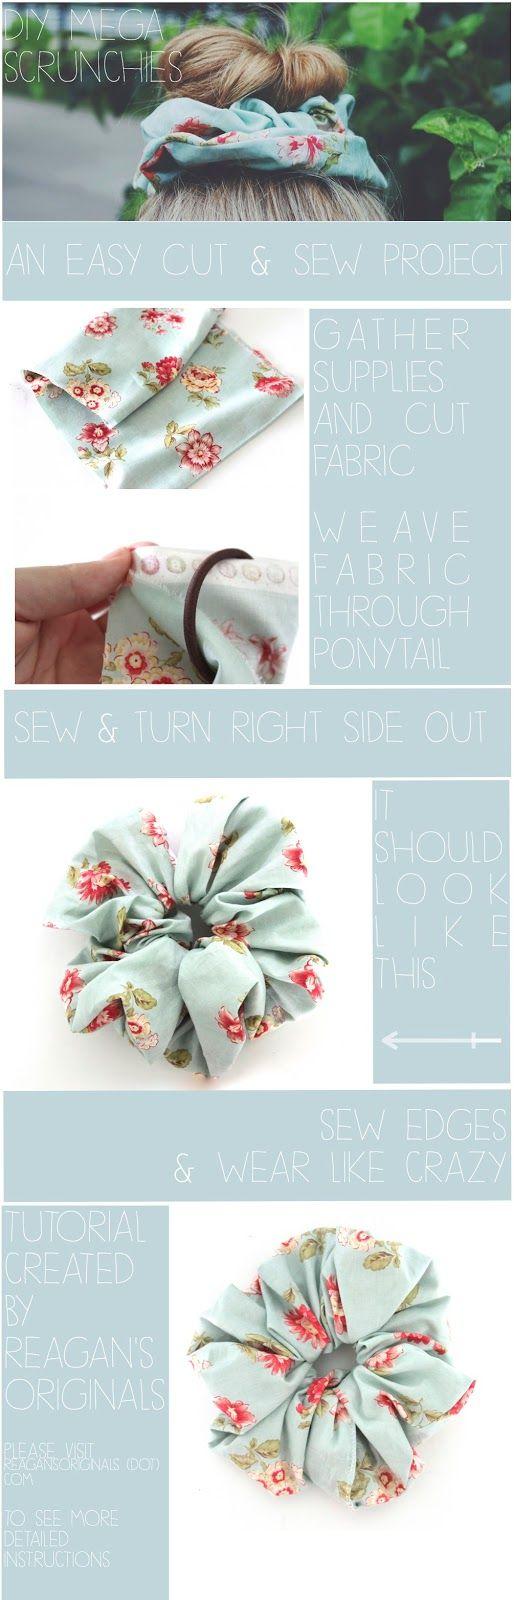 LilyAllsorts: DIY Hair Scrunchie: Pinterest Challenge February